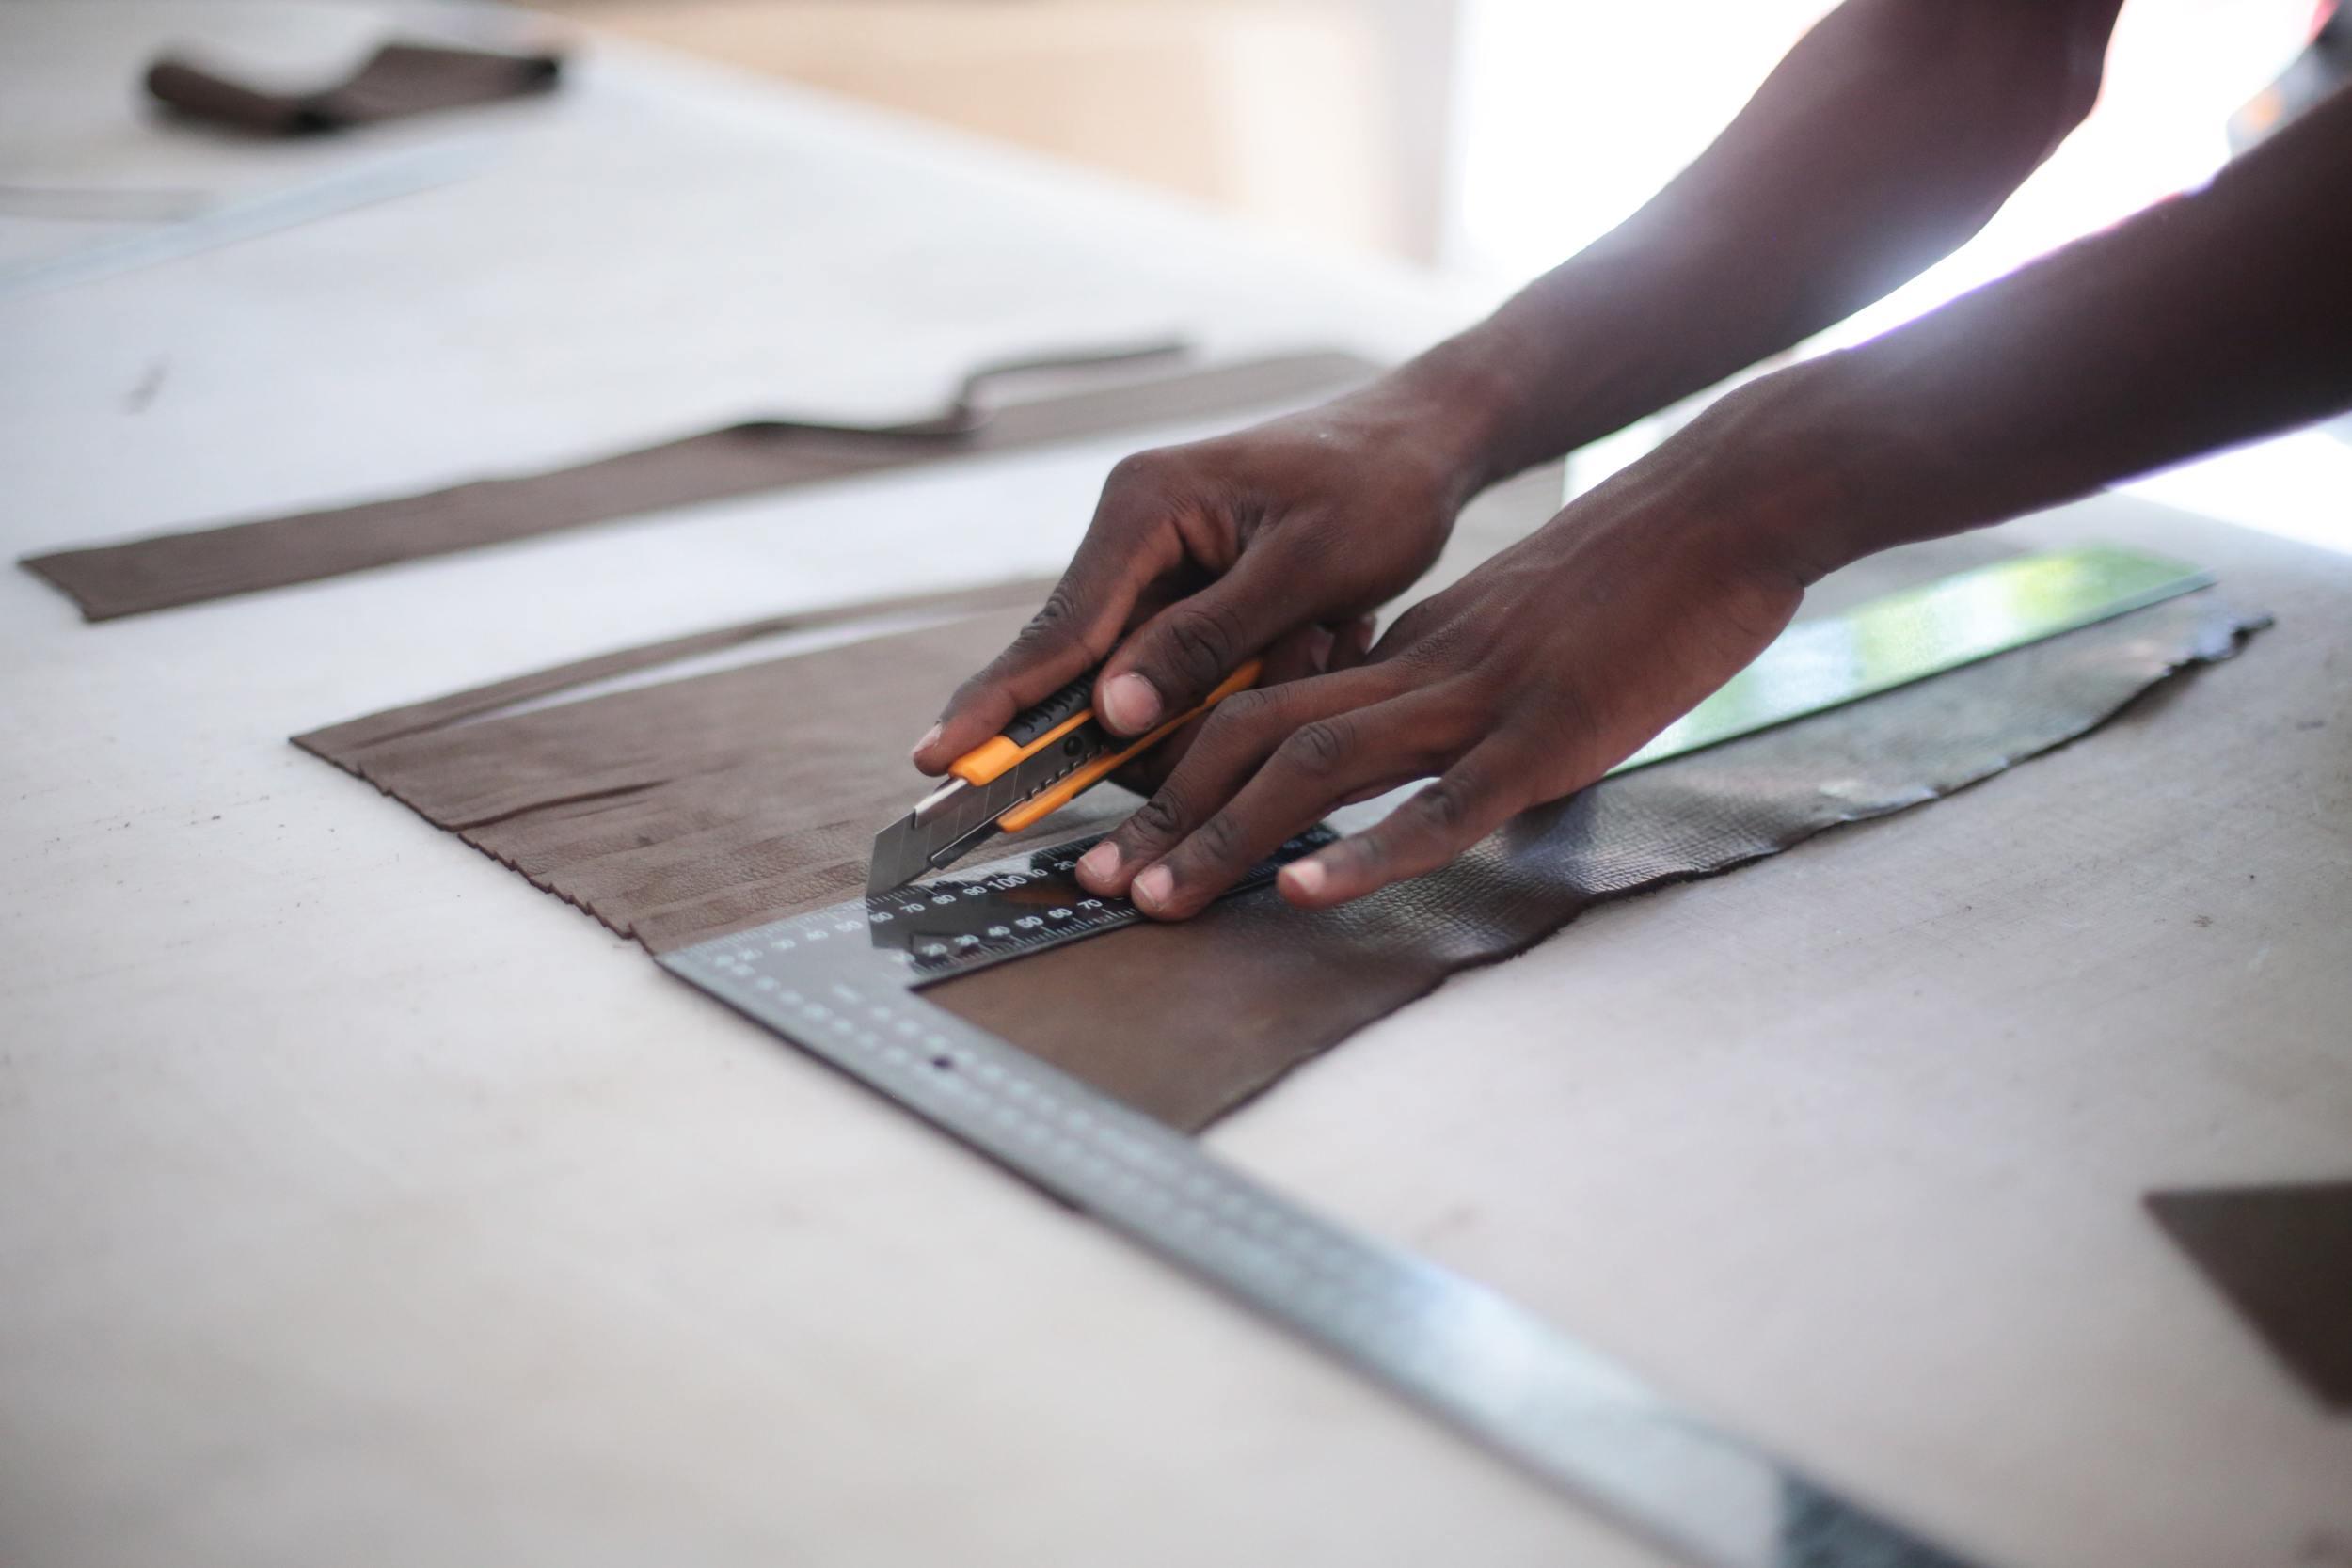 haiti design co-op